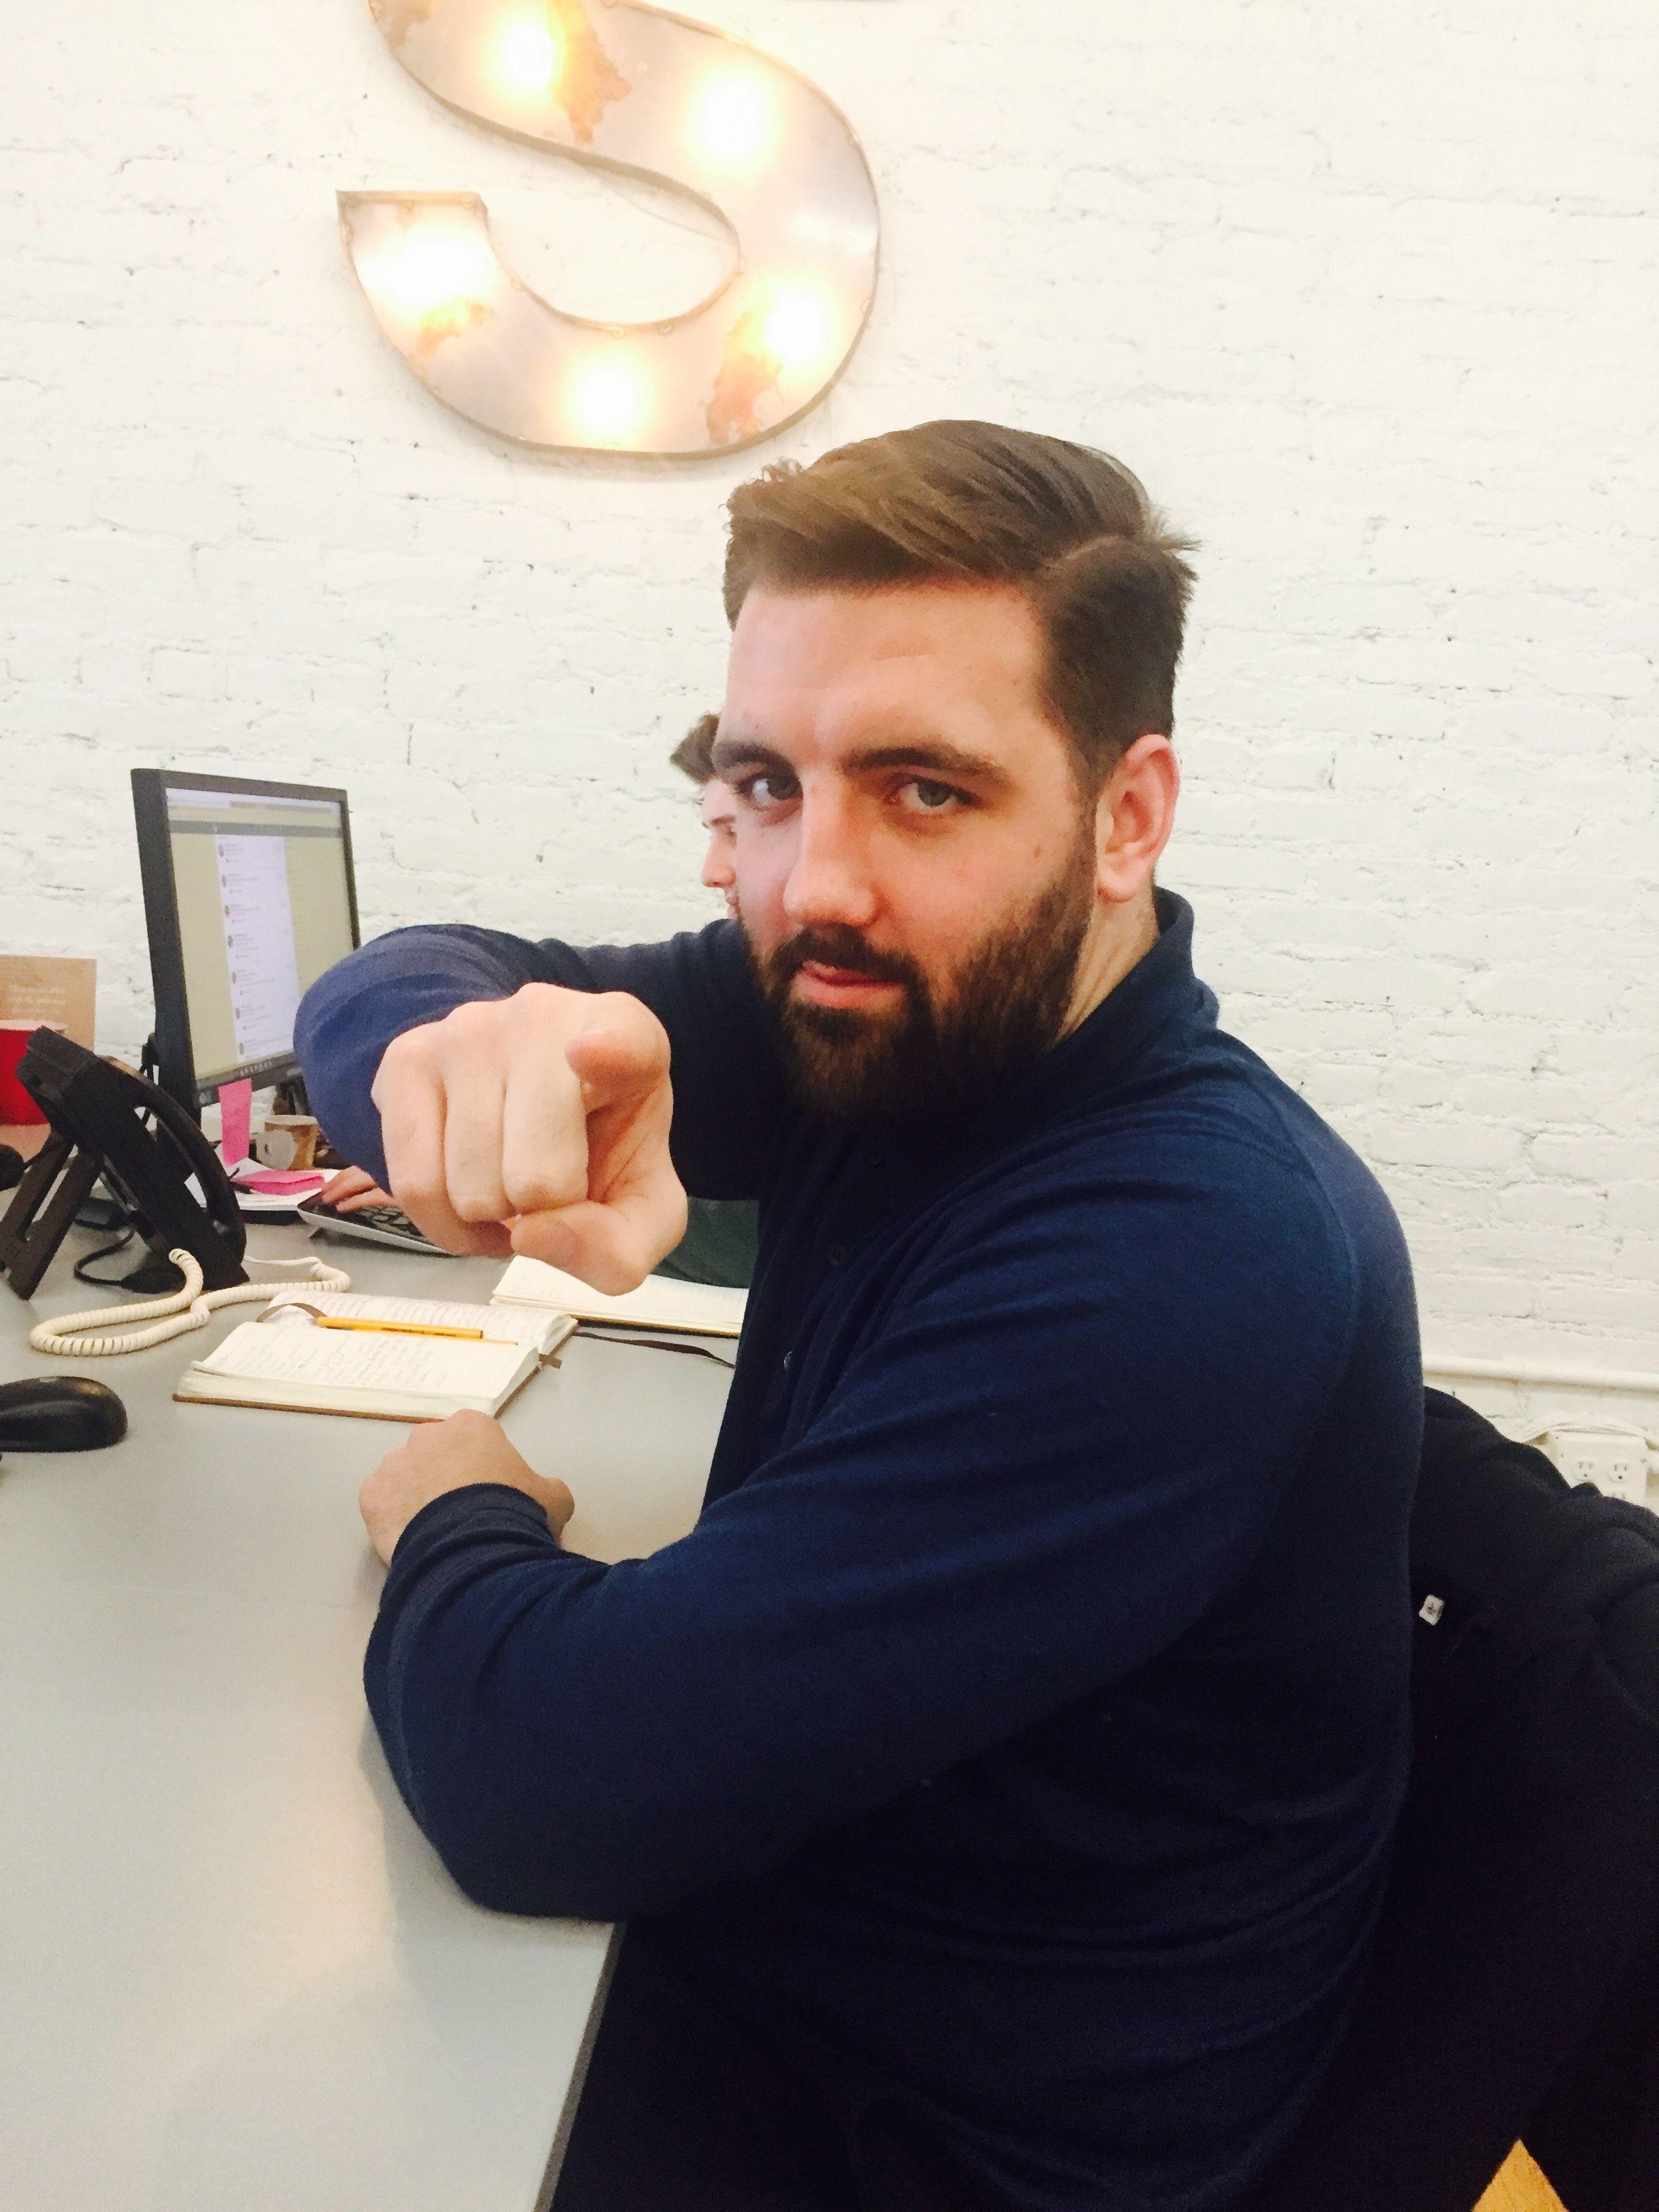 Dave C. - DigitalOcean NYC (New York, NY) | Meetup